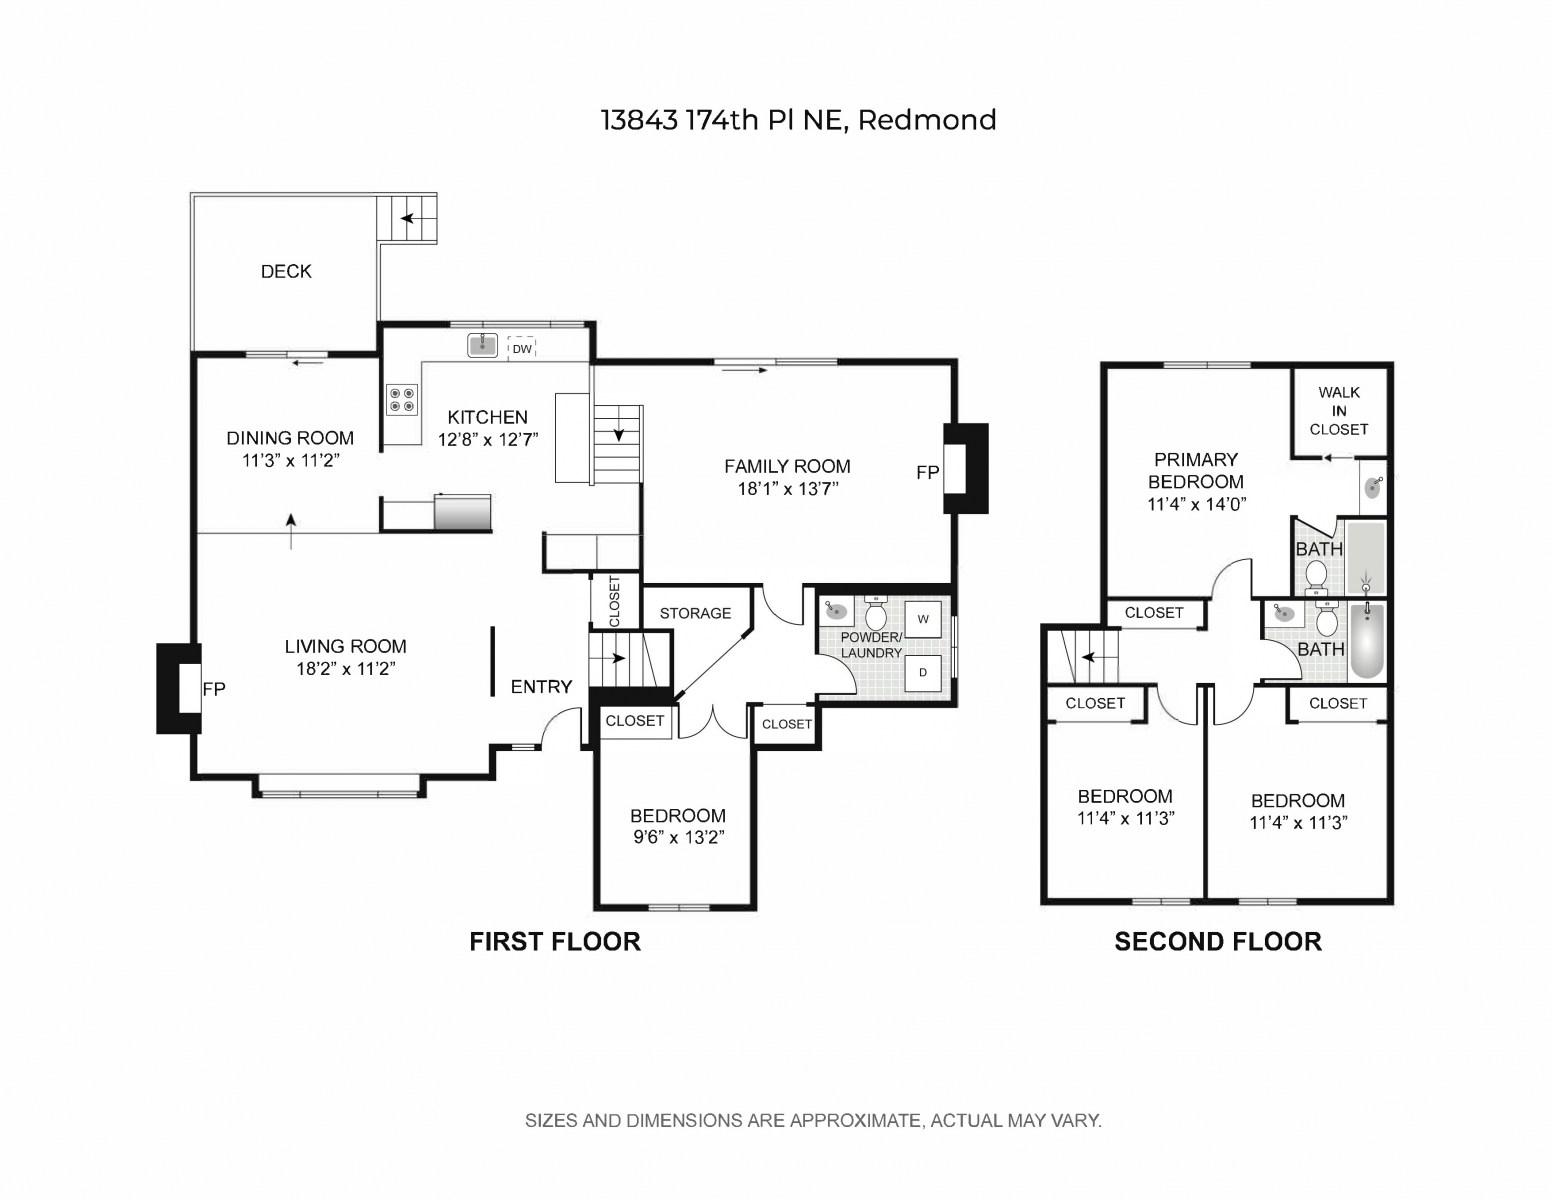 13843-174th-Pl-NE-Redmond-Floorplan